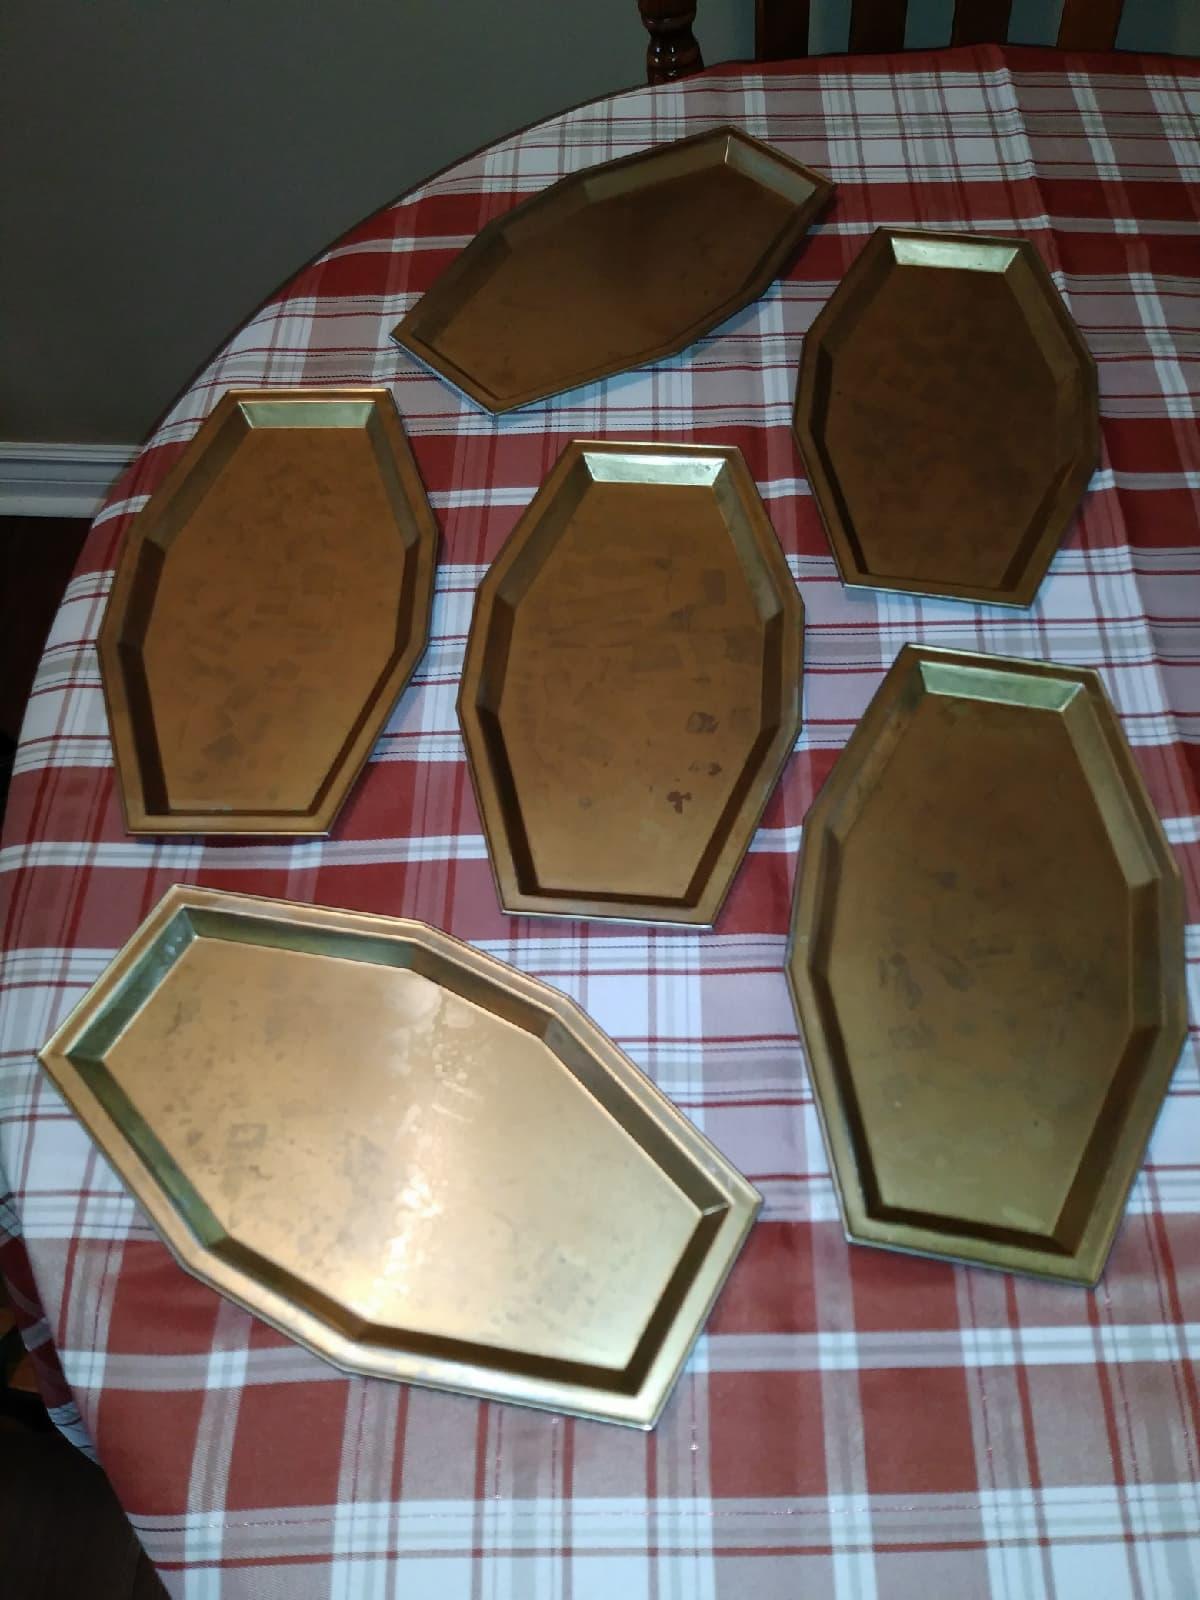 Set of 6 small brass trays - $10.00